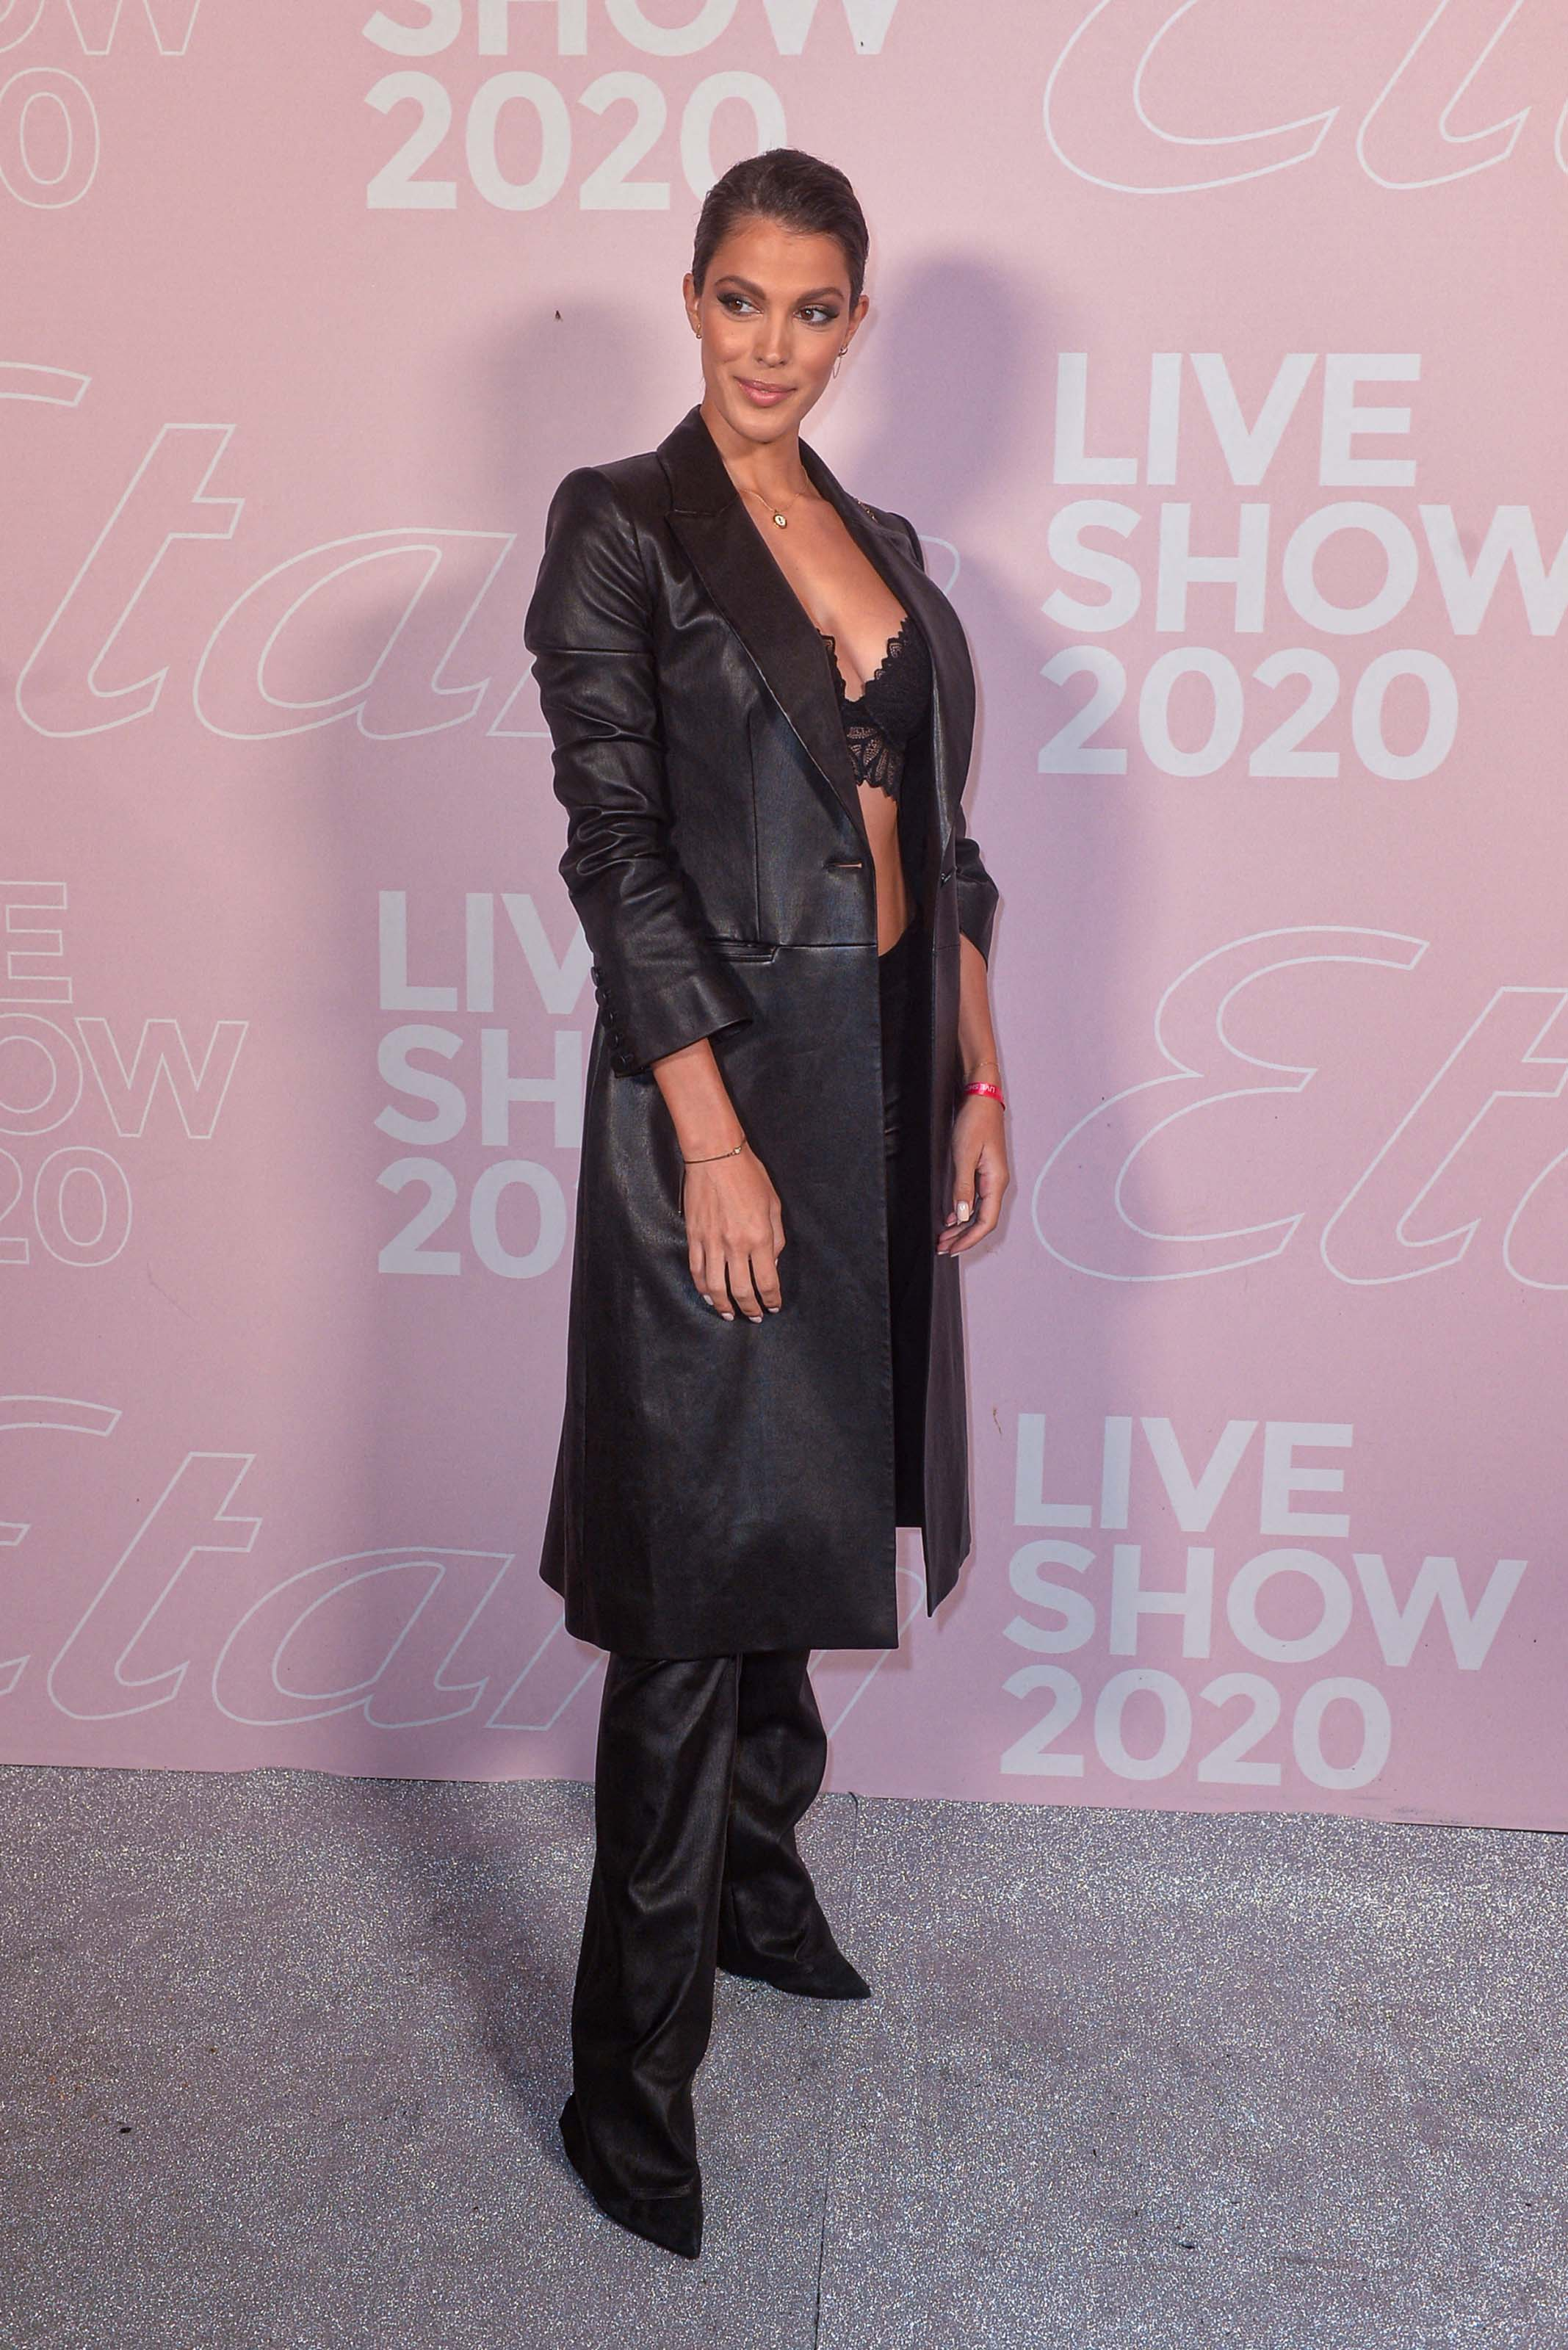 Iris Mittenaere attends the Etam Womenswear Spring/Summer 2021 show